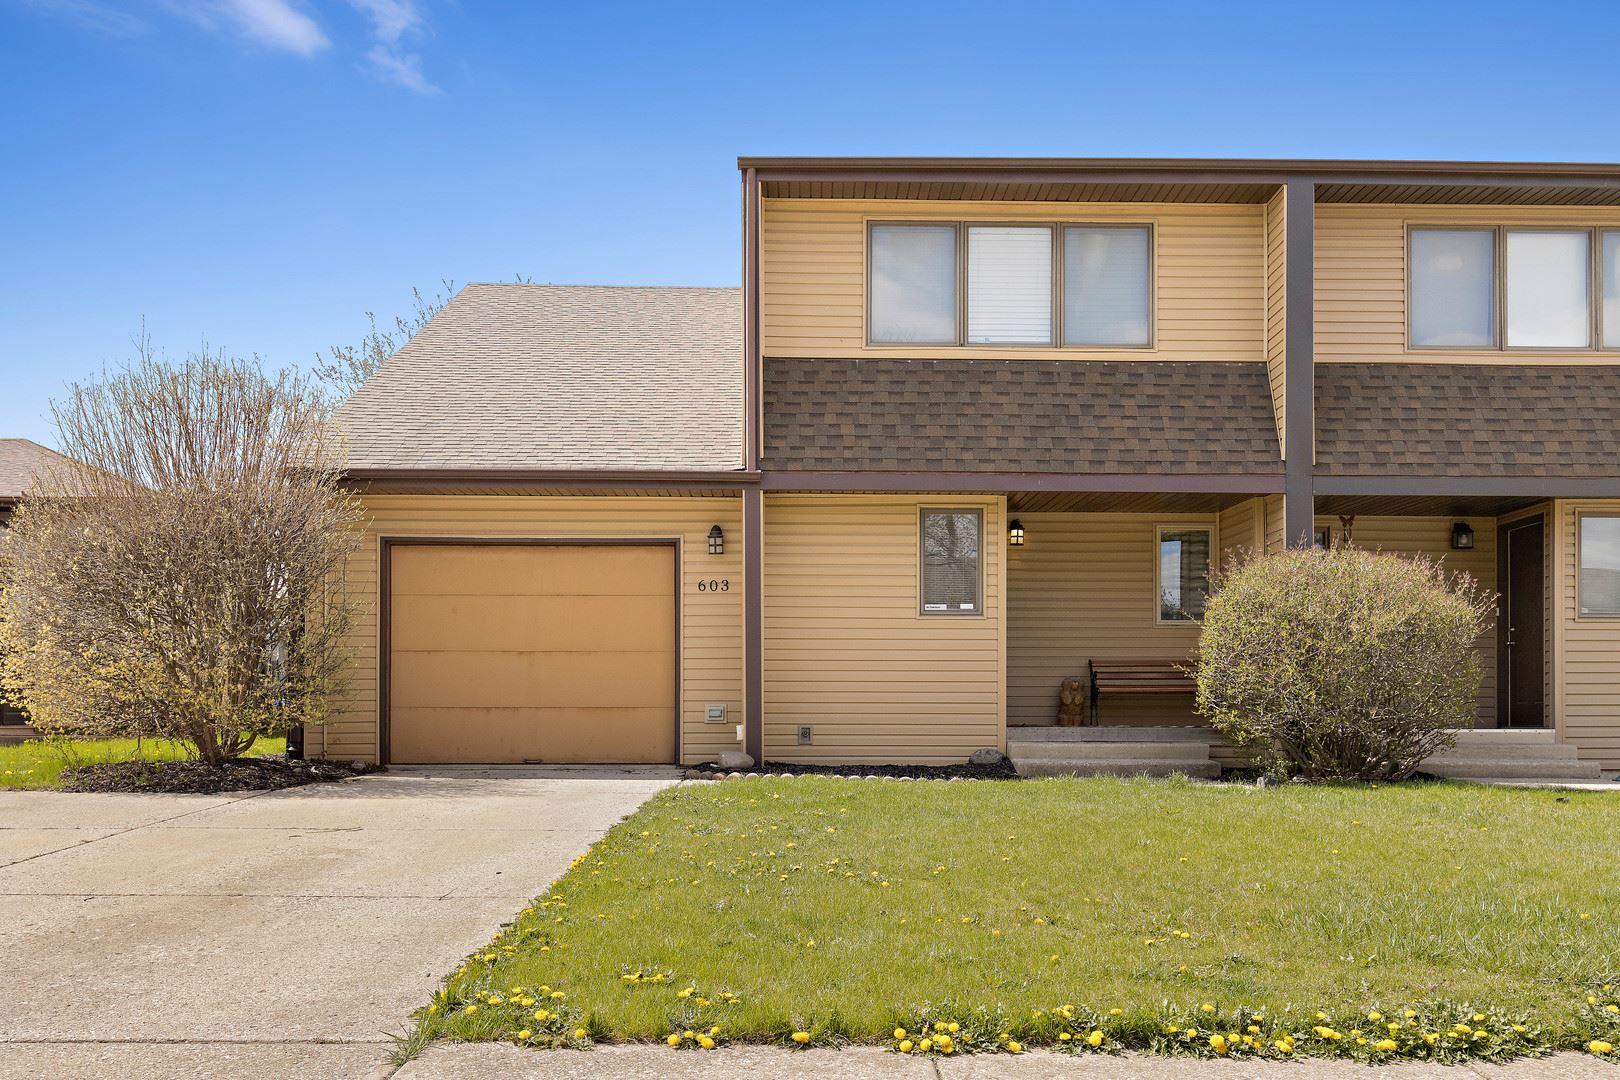 Photo of 603 S Raven Road, Shorewood, IL 60404 (MLS # 11055599)